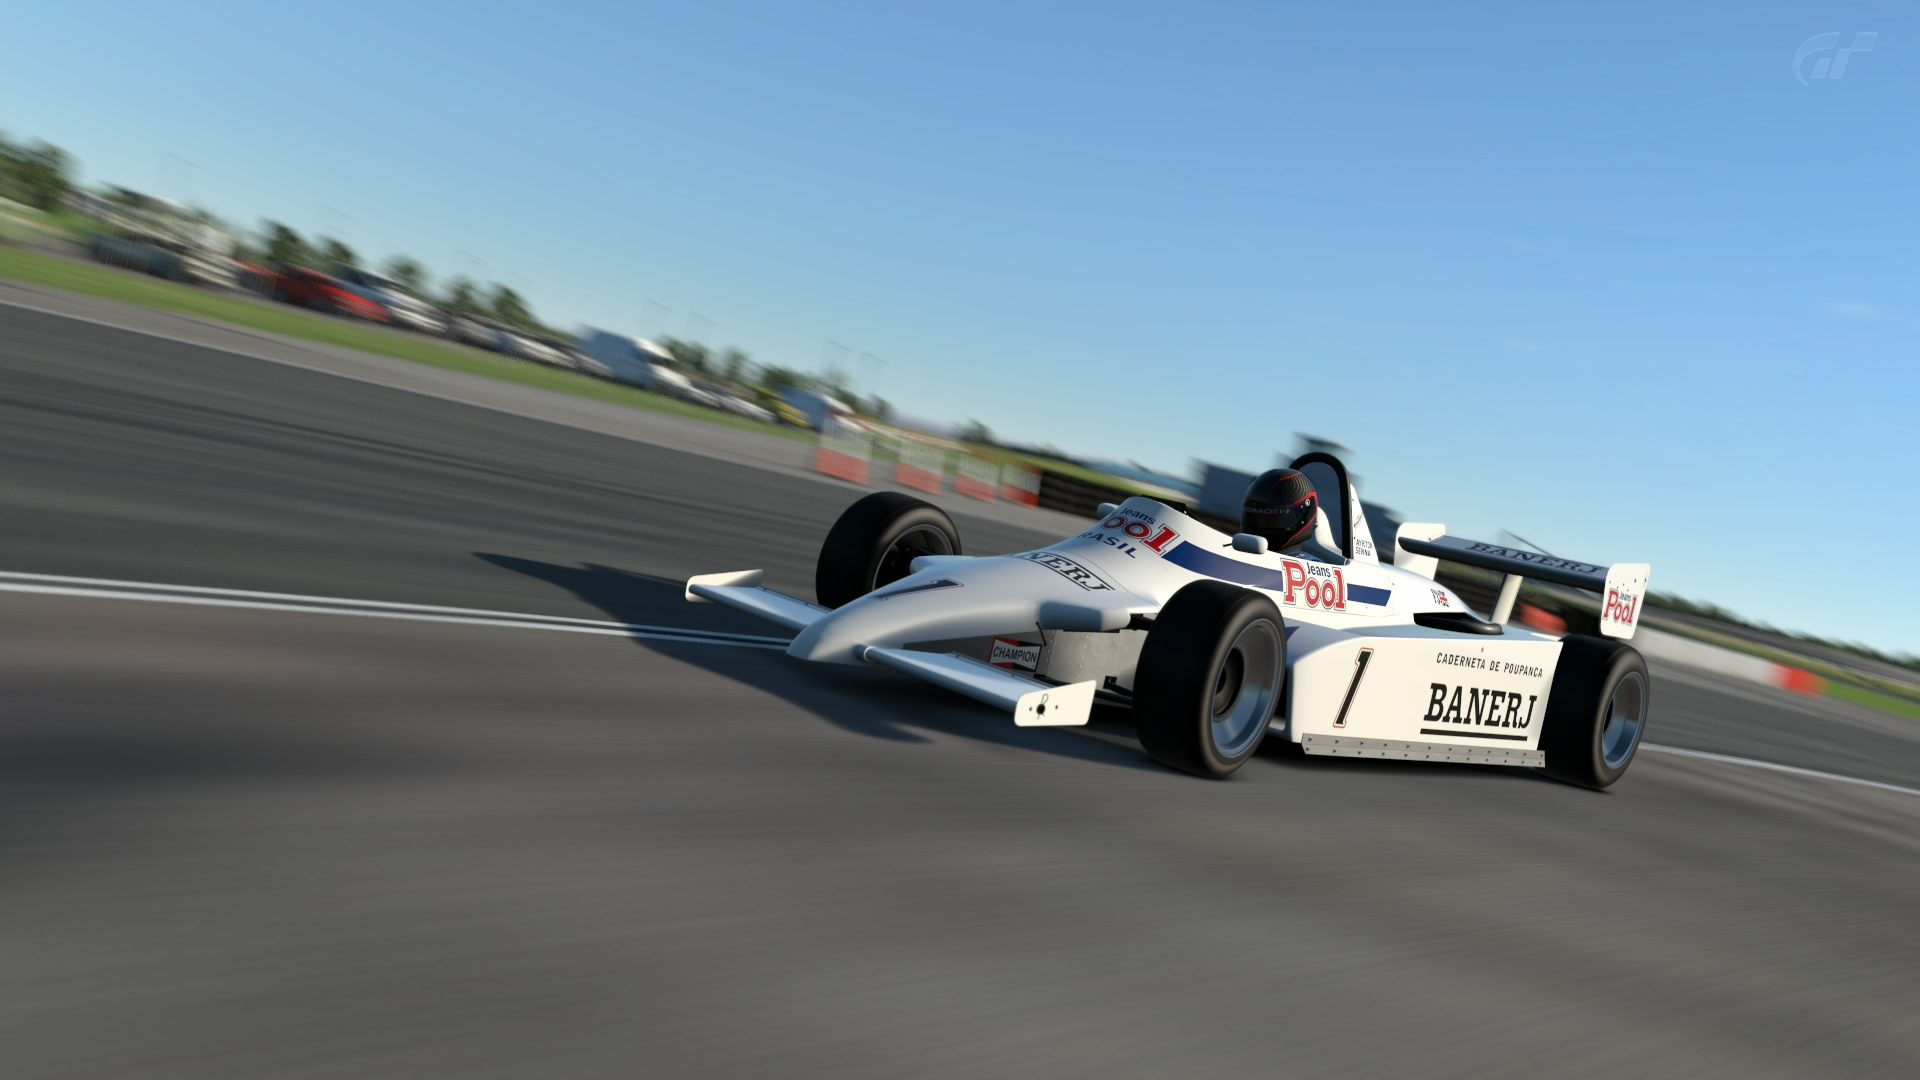 Silverstone_ Stowe Circuit_10.jpg